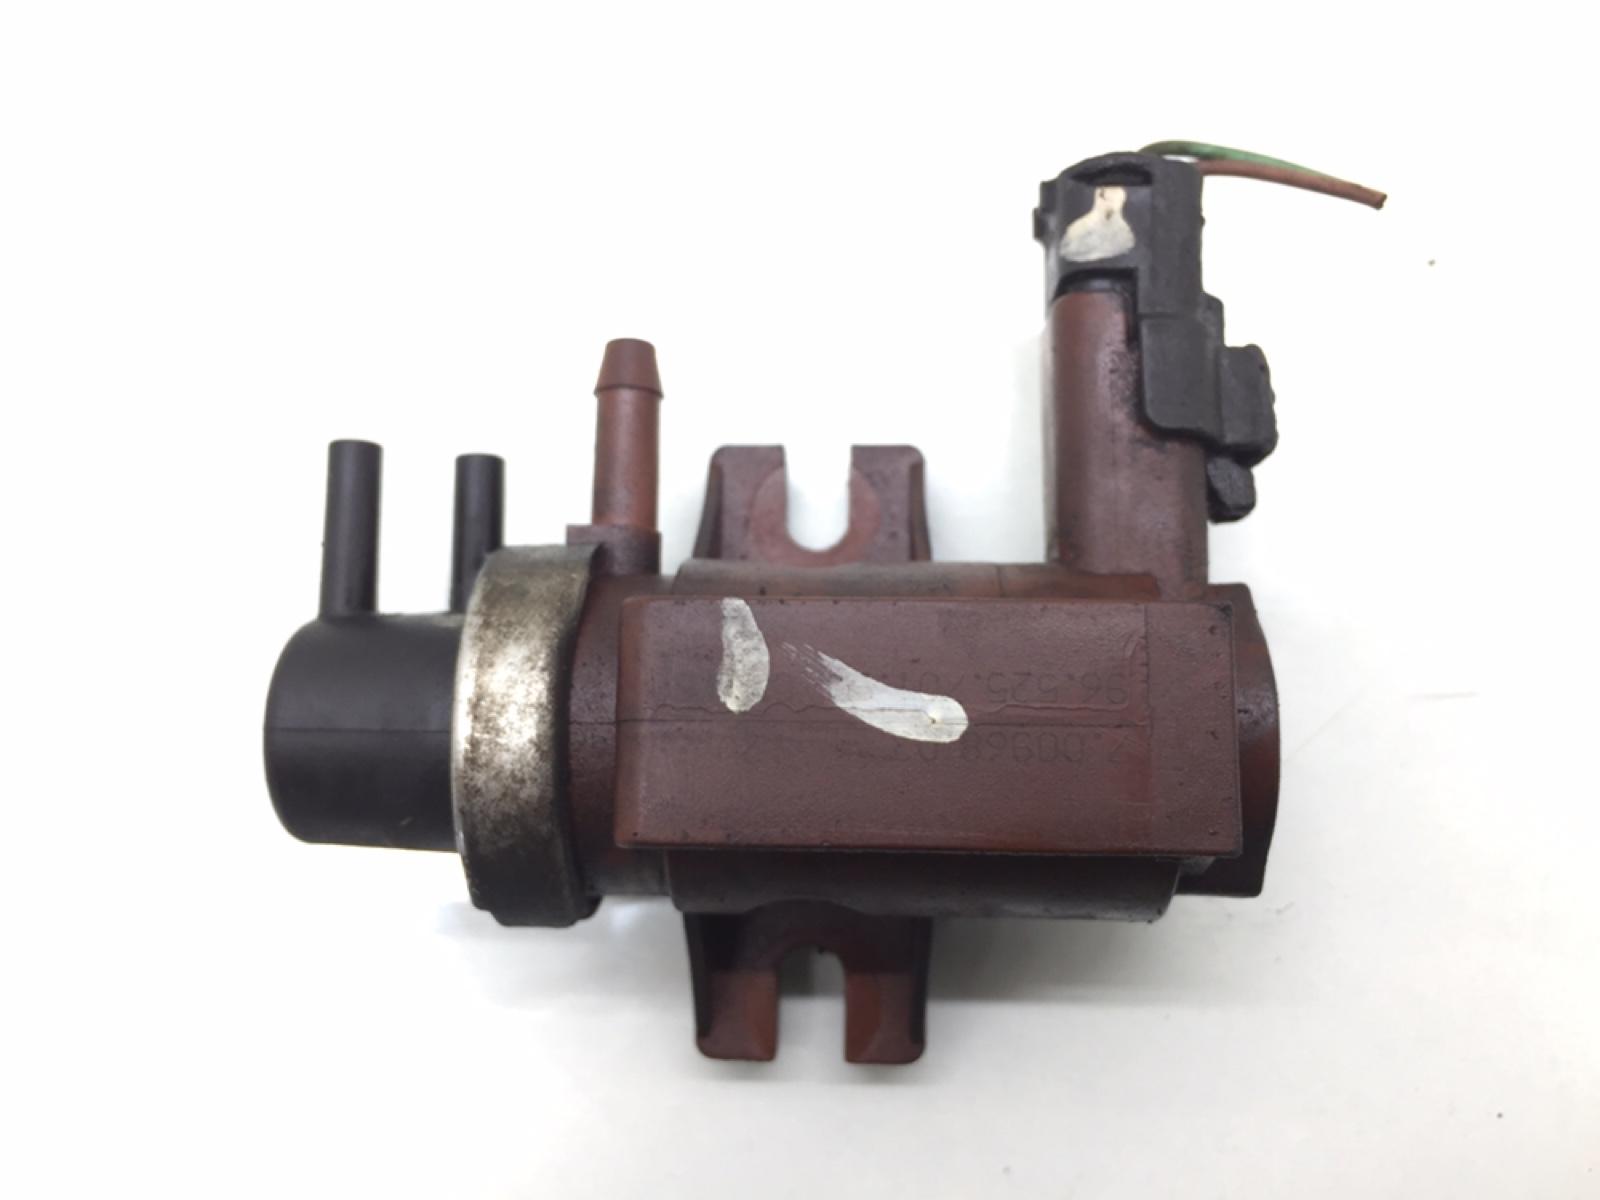 Клапан электромагнитный Peugeot 308 T7 1.6 HDI 2008 (б/у)